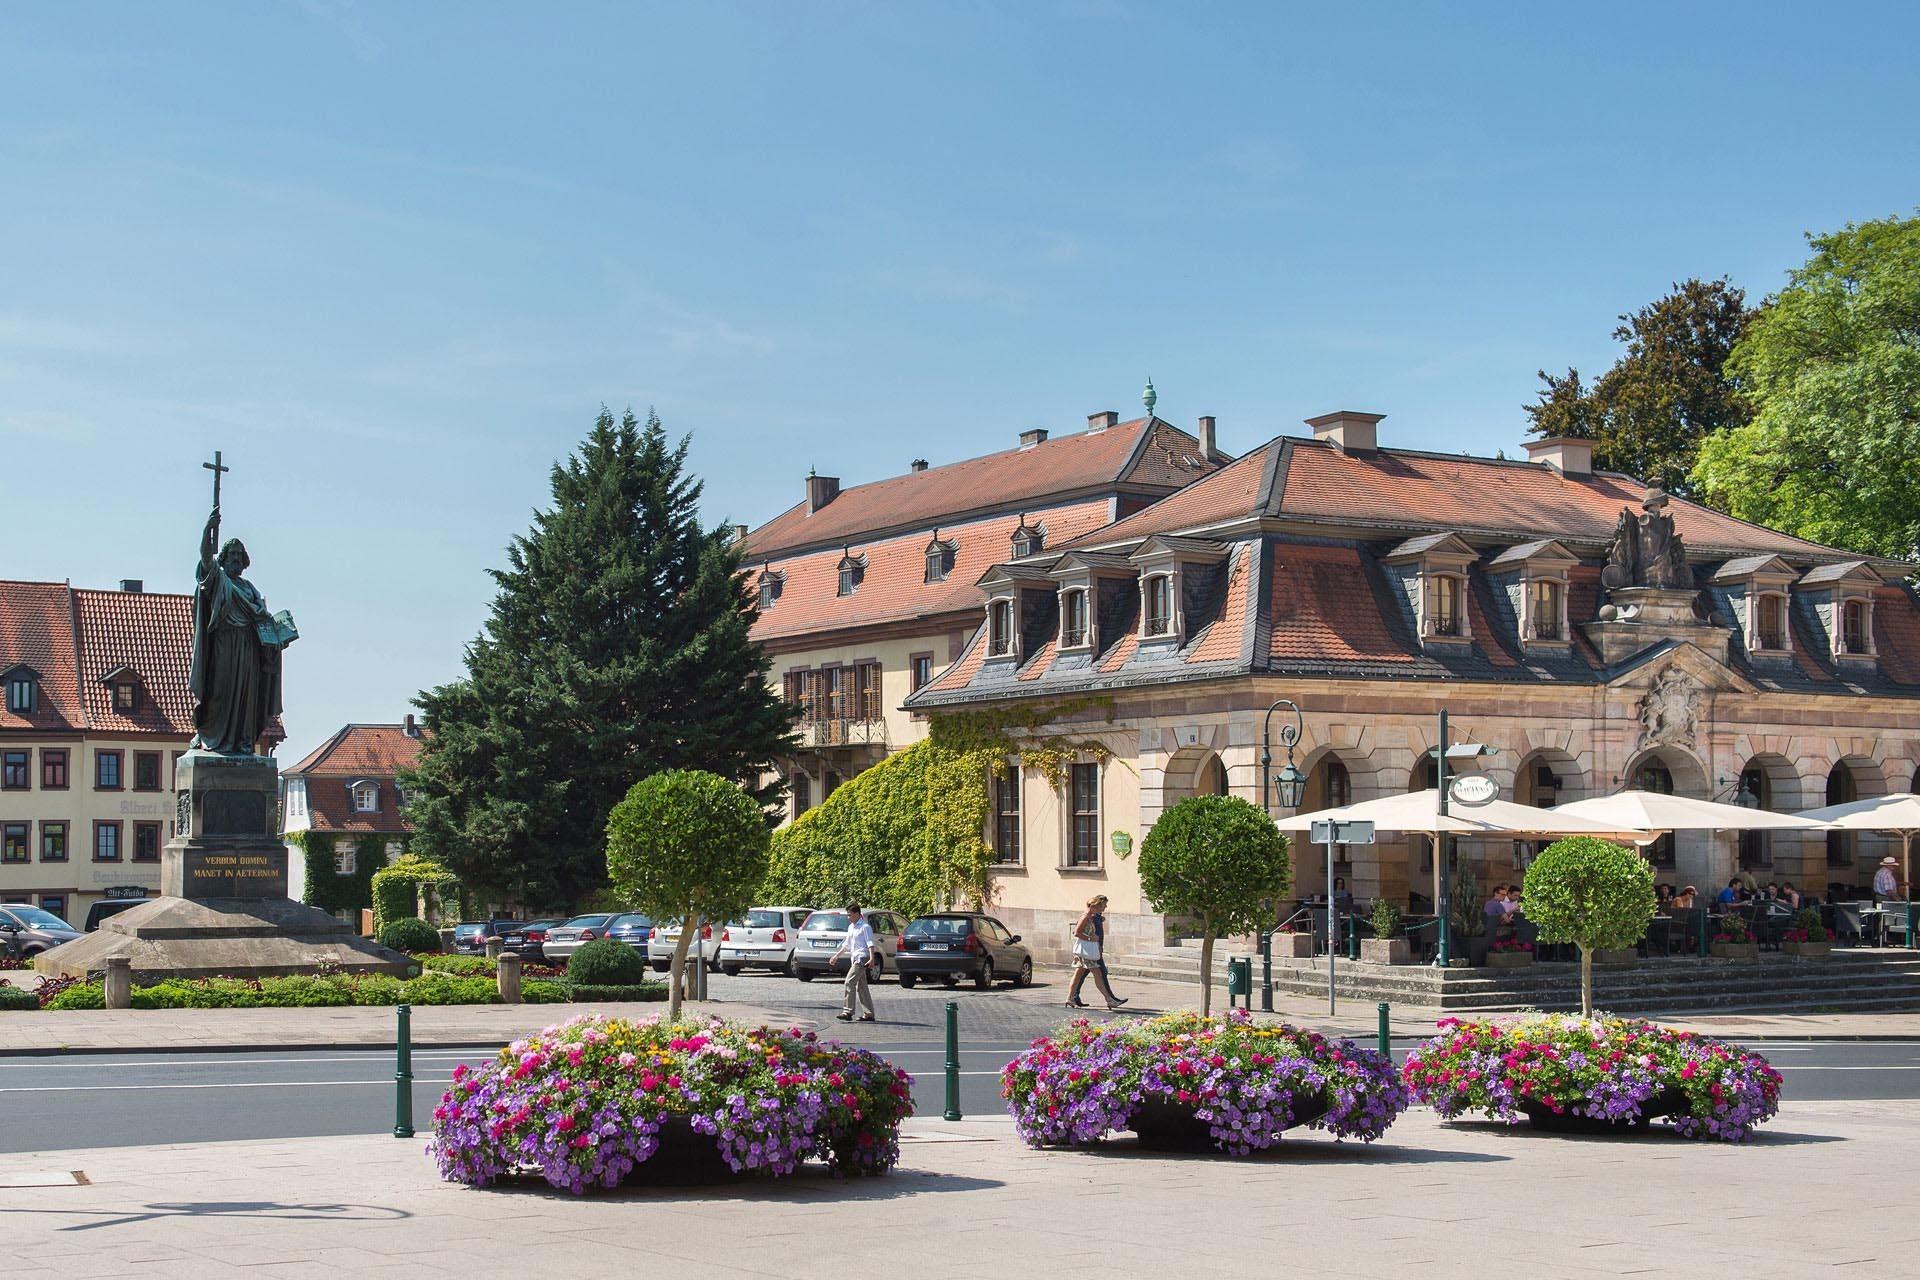 Angebote in Fulda, Shopping Fulda, Einkaufen Fulda